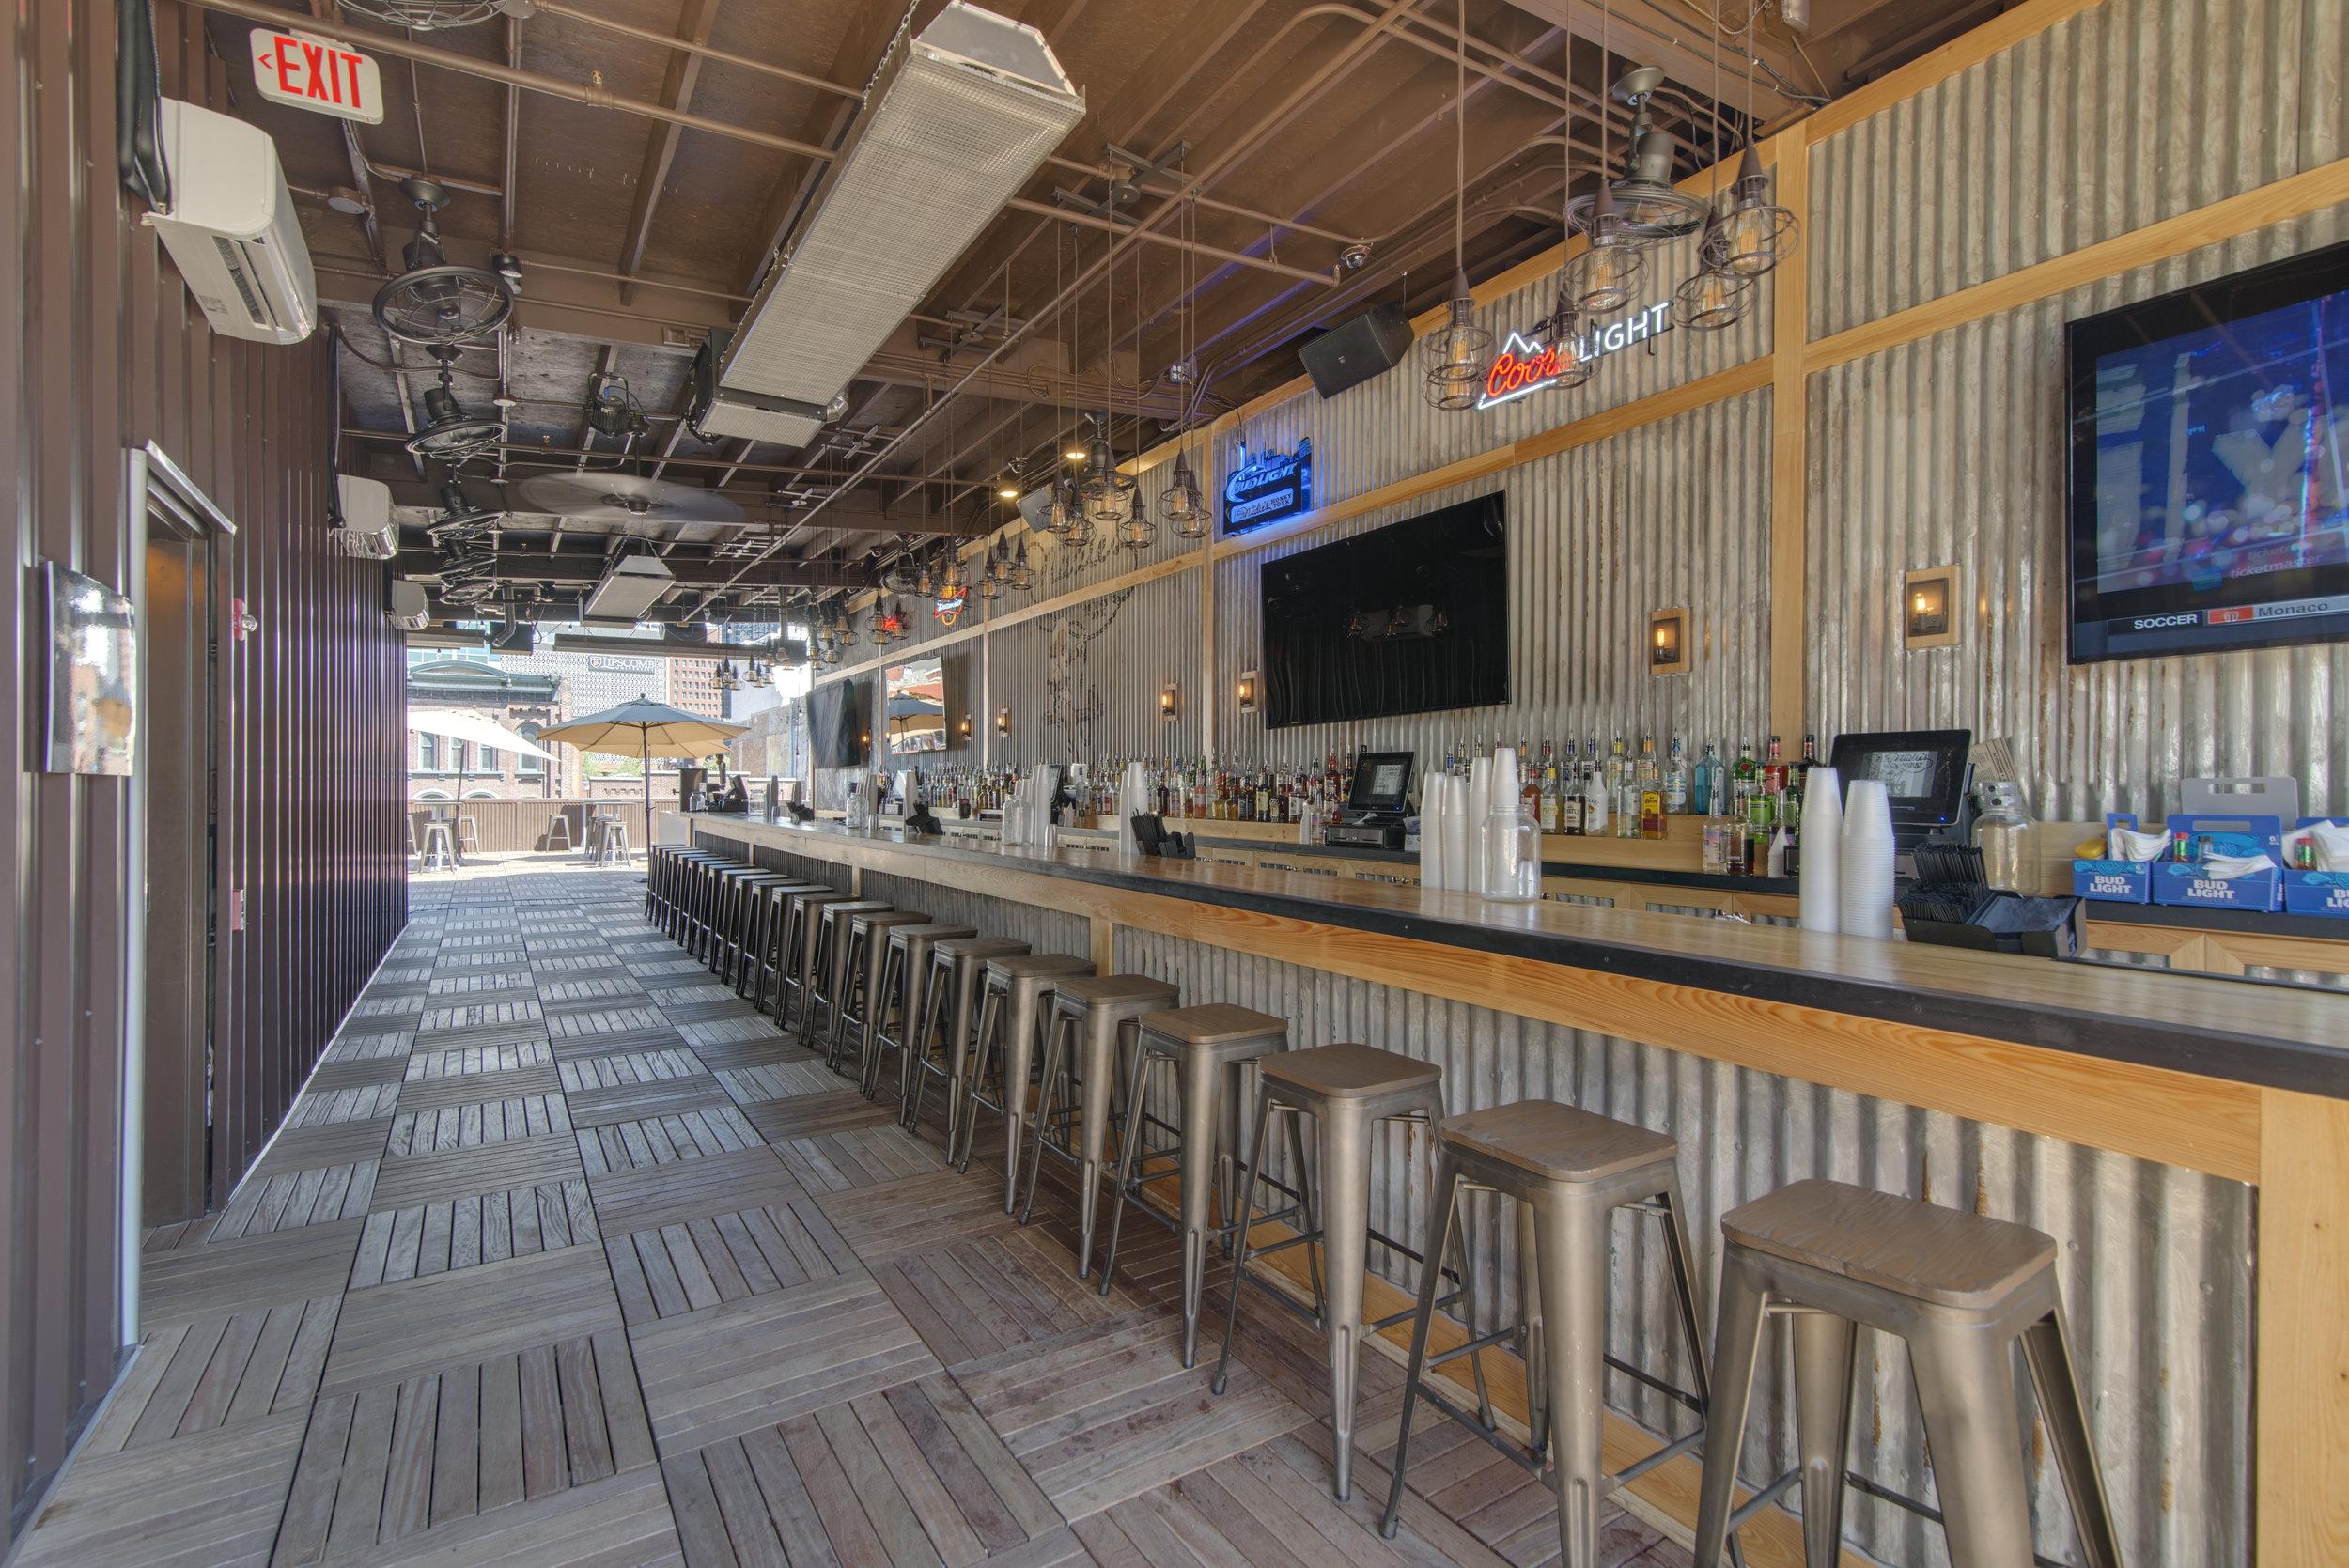 Nashville Rooftop - Nudie's Honky Tonk